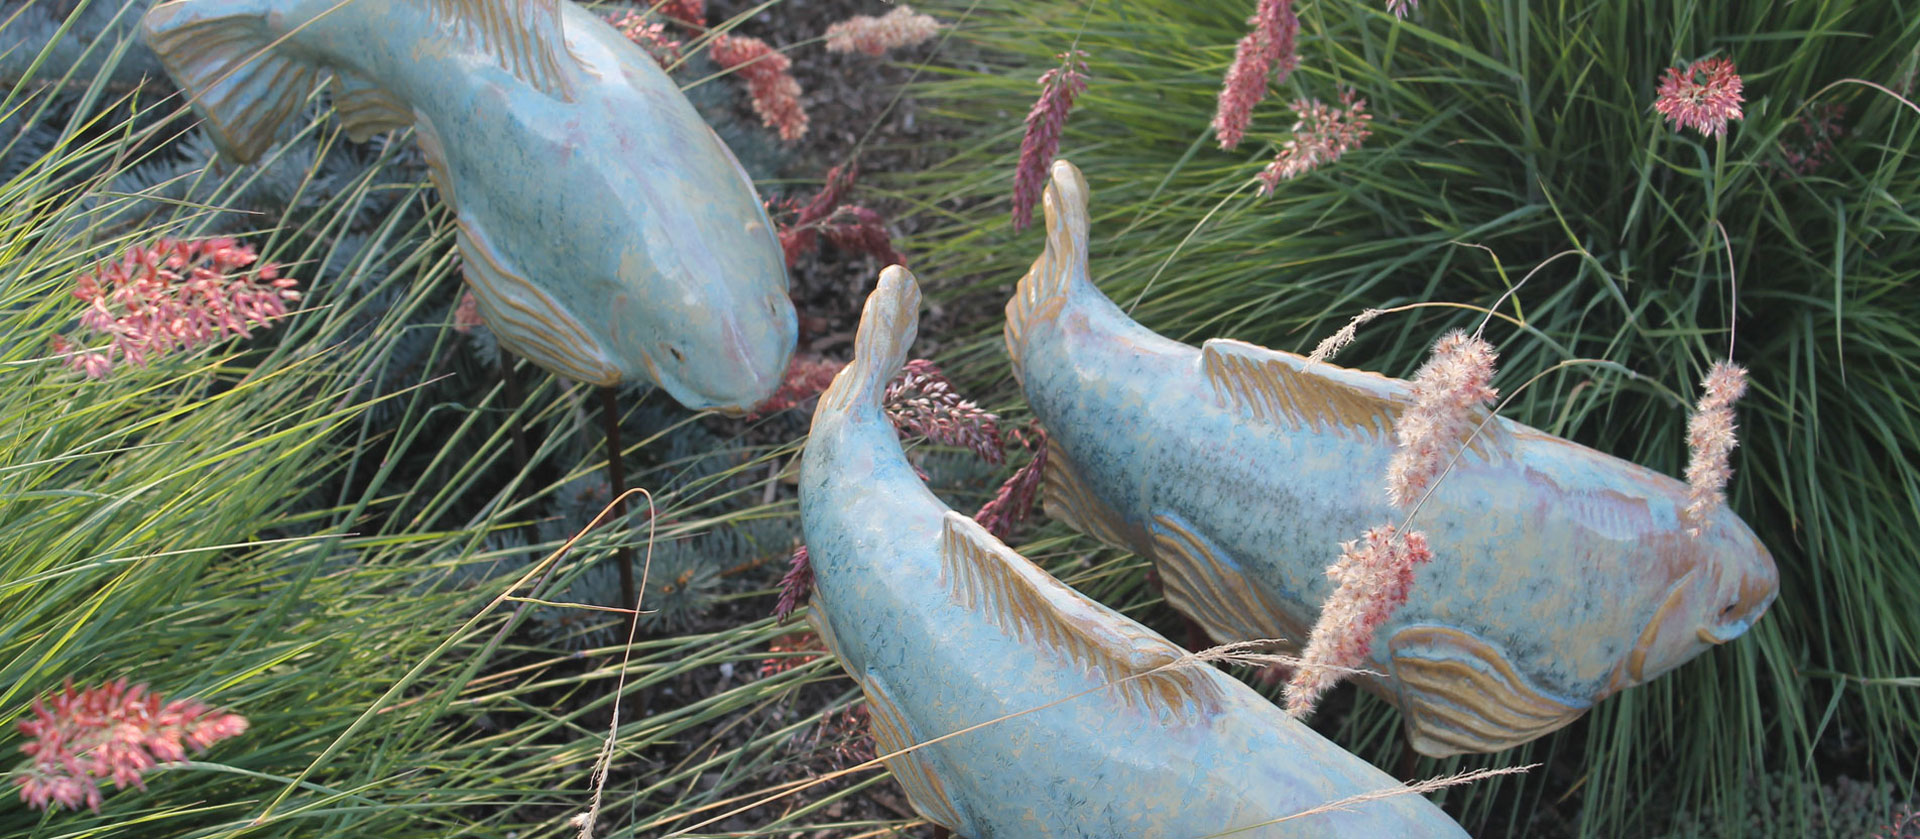 Shop garden art find garden sculpture buy fish garden art for Garden fish